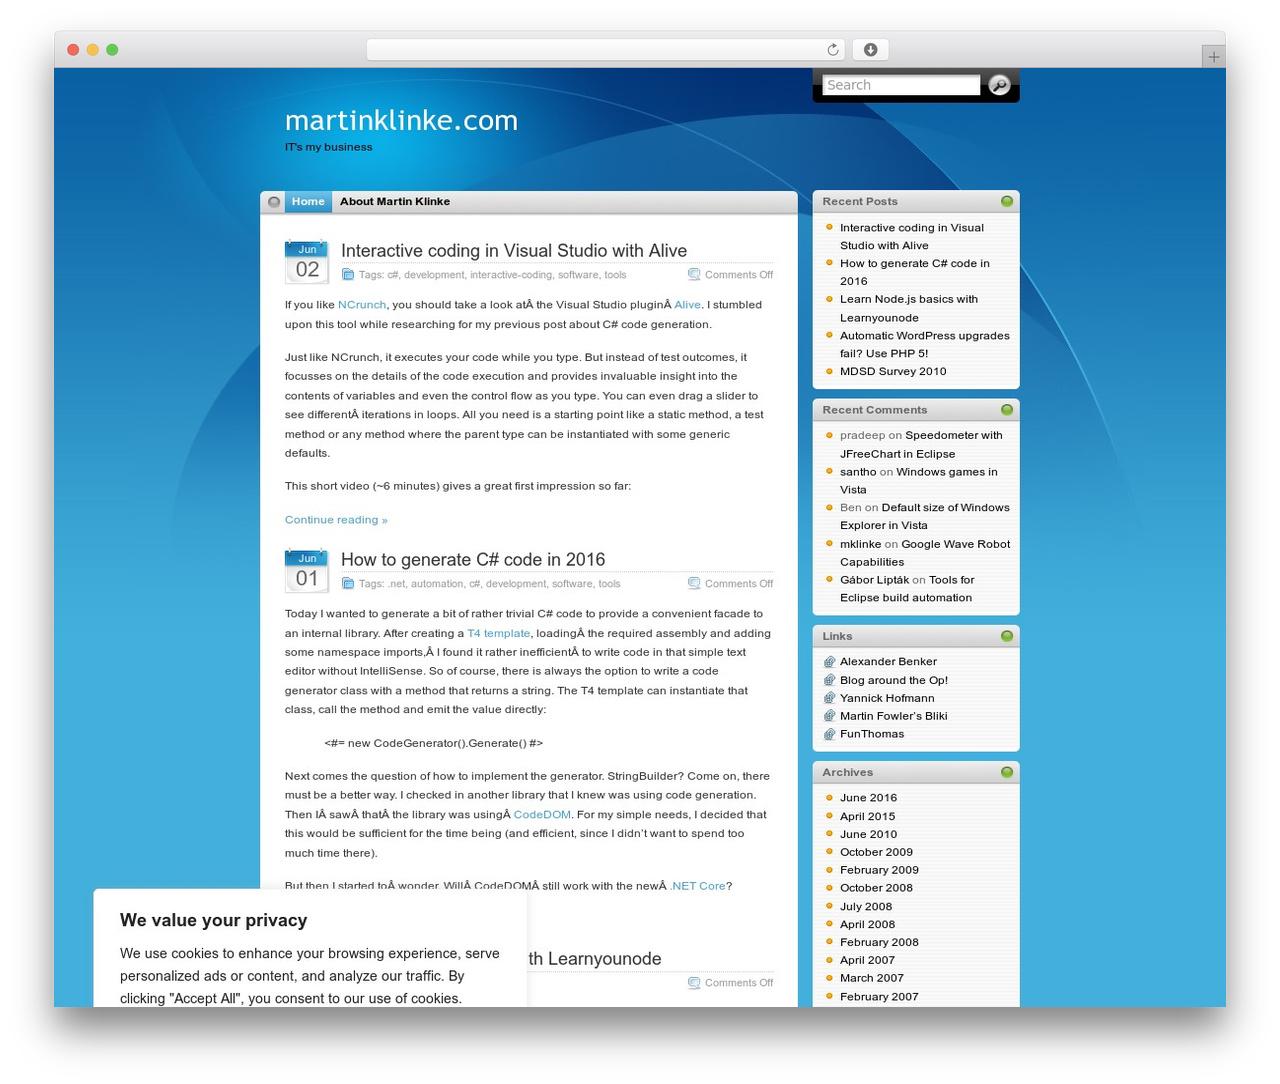 WordPress theme iTheme - martinklinke.com